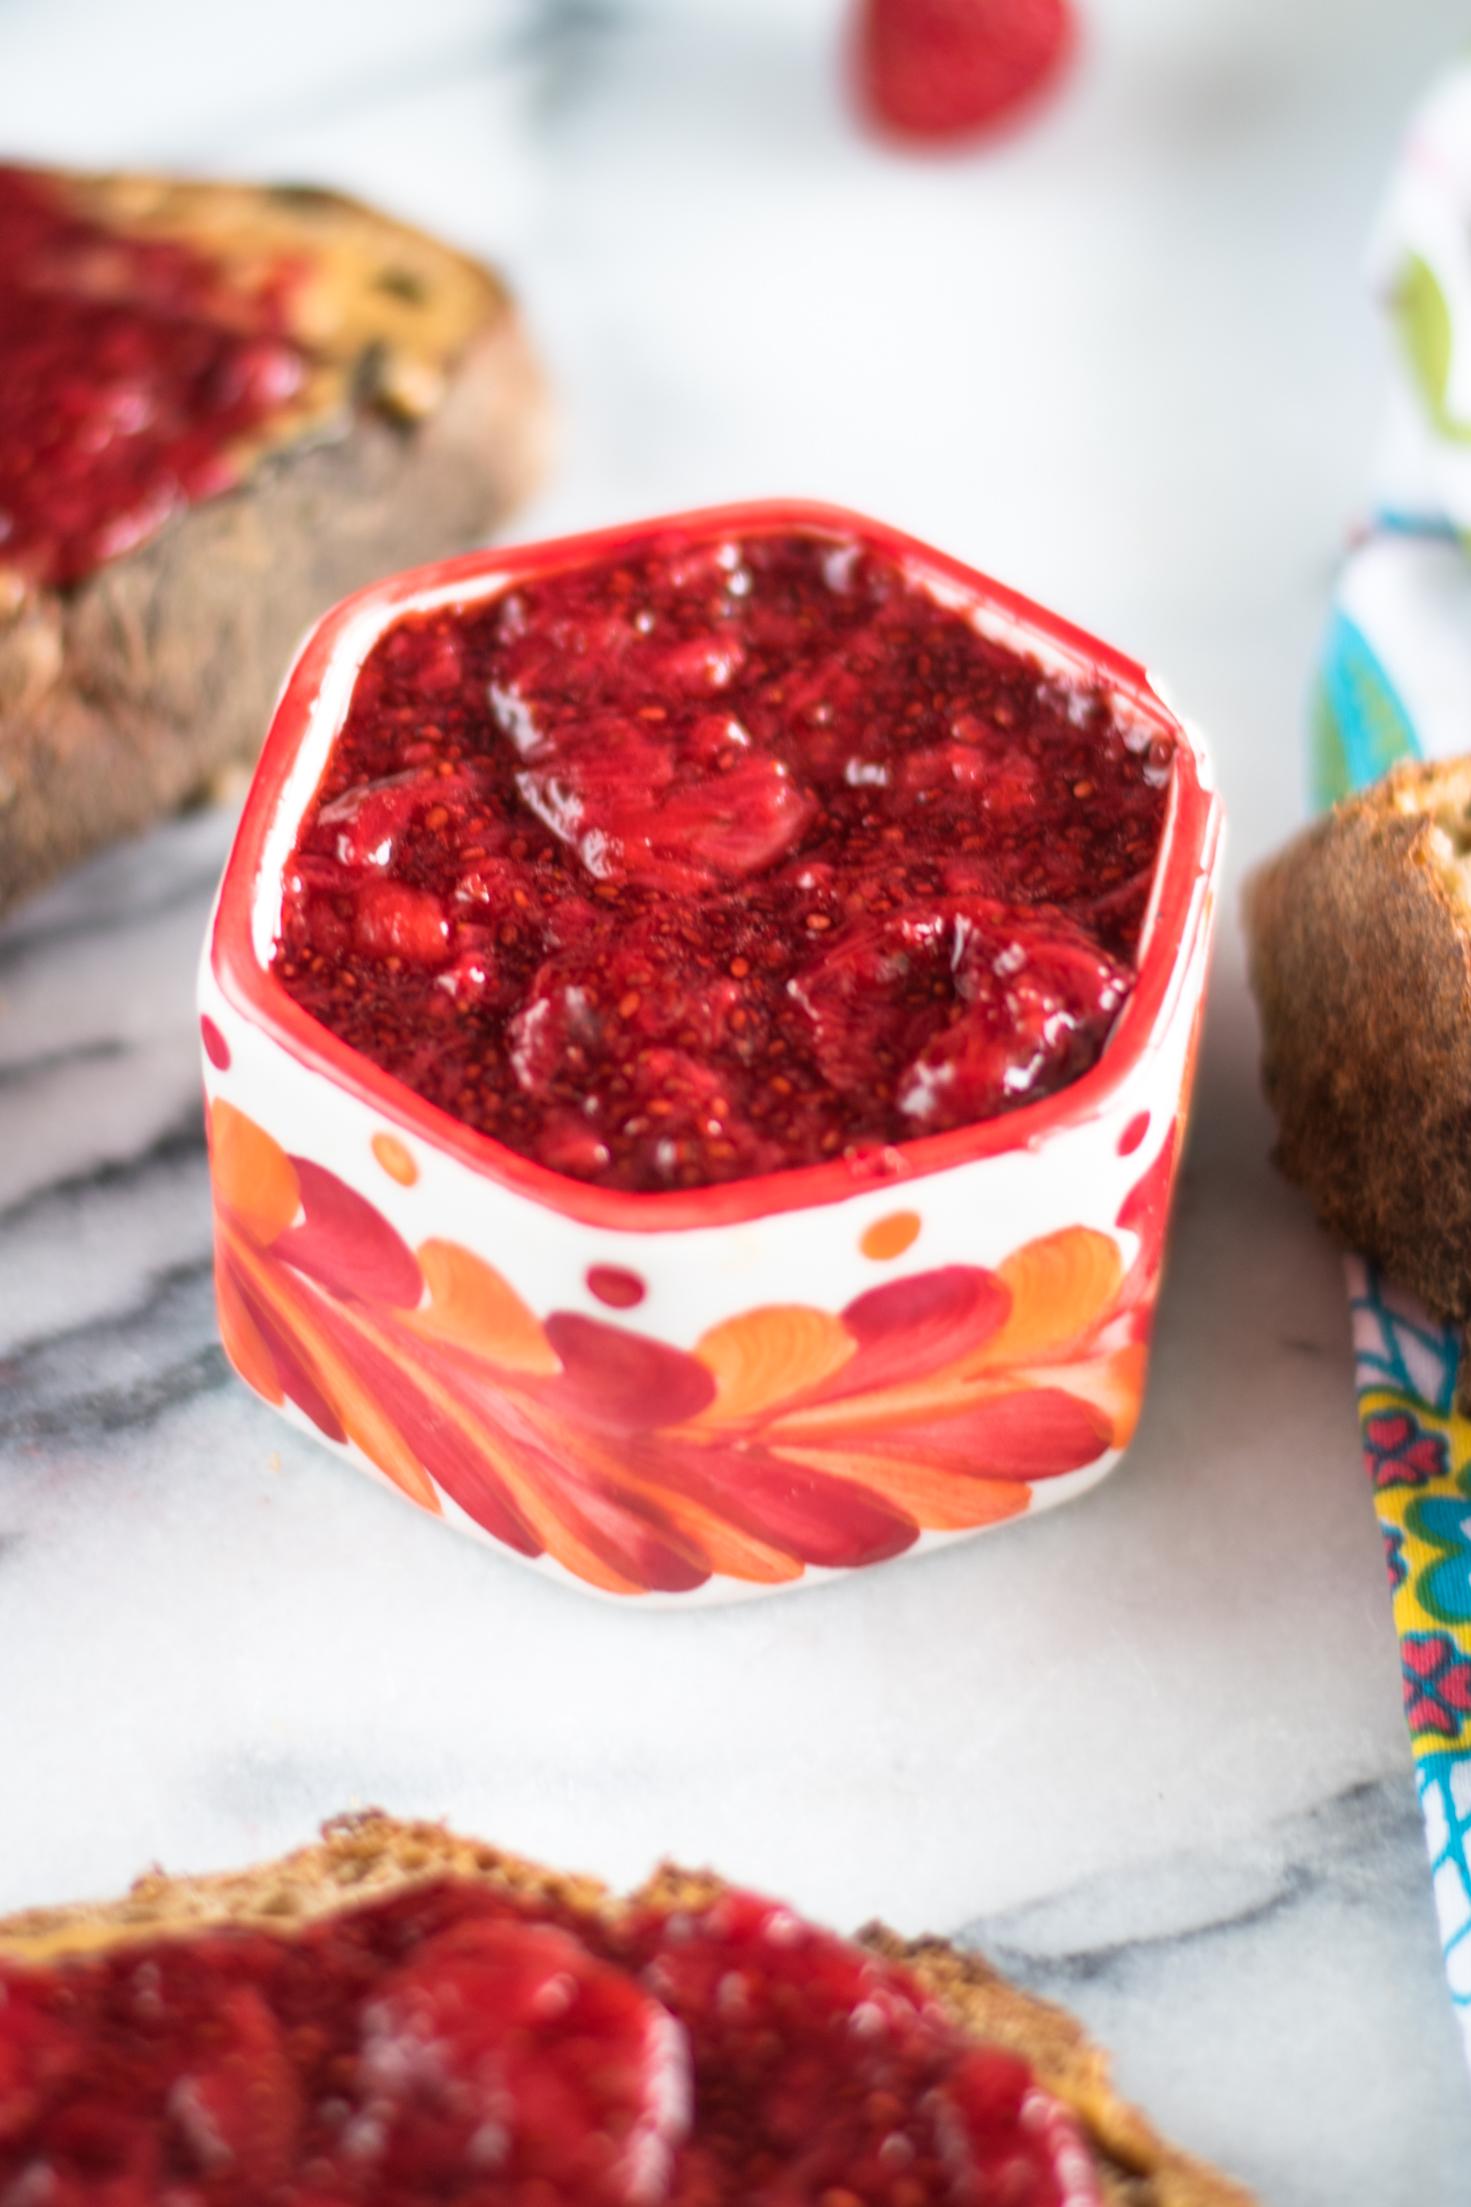 Strawberry Vanilla Chia Jam is quick and easy to make. Plus, it's naturally sweetened. #jam #strawberry #chia #vegan #healthy #recipes #glutenfree